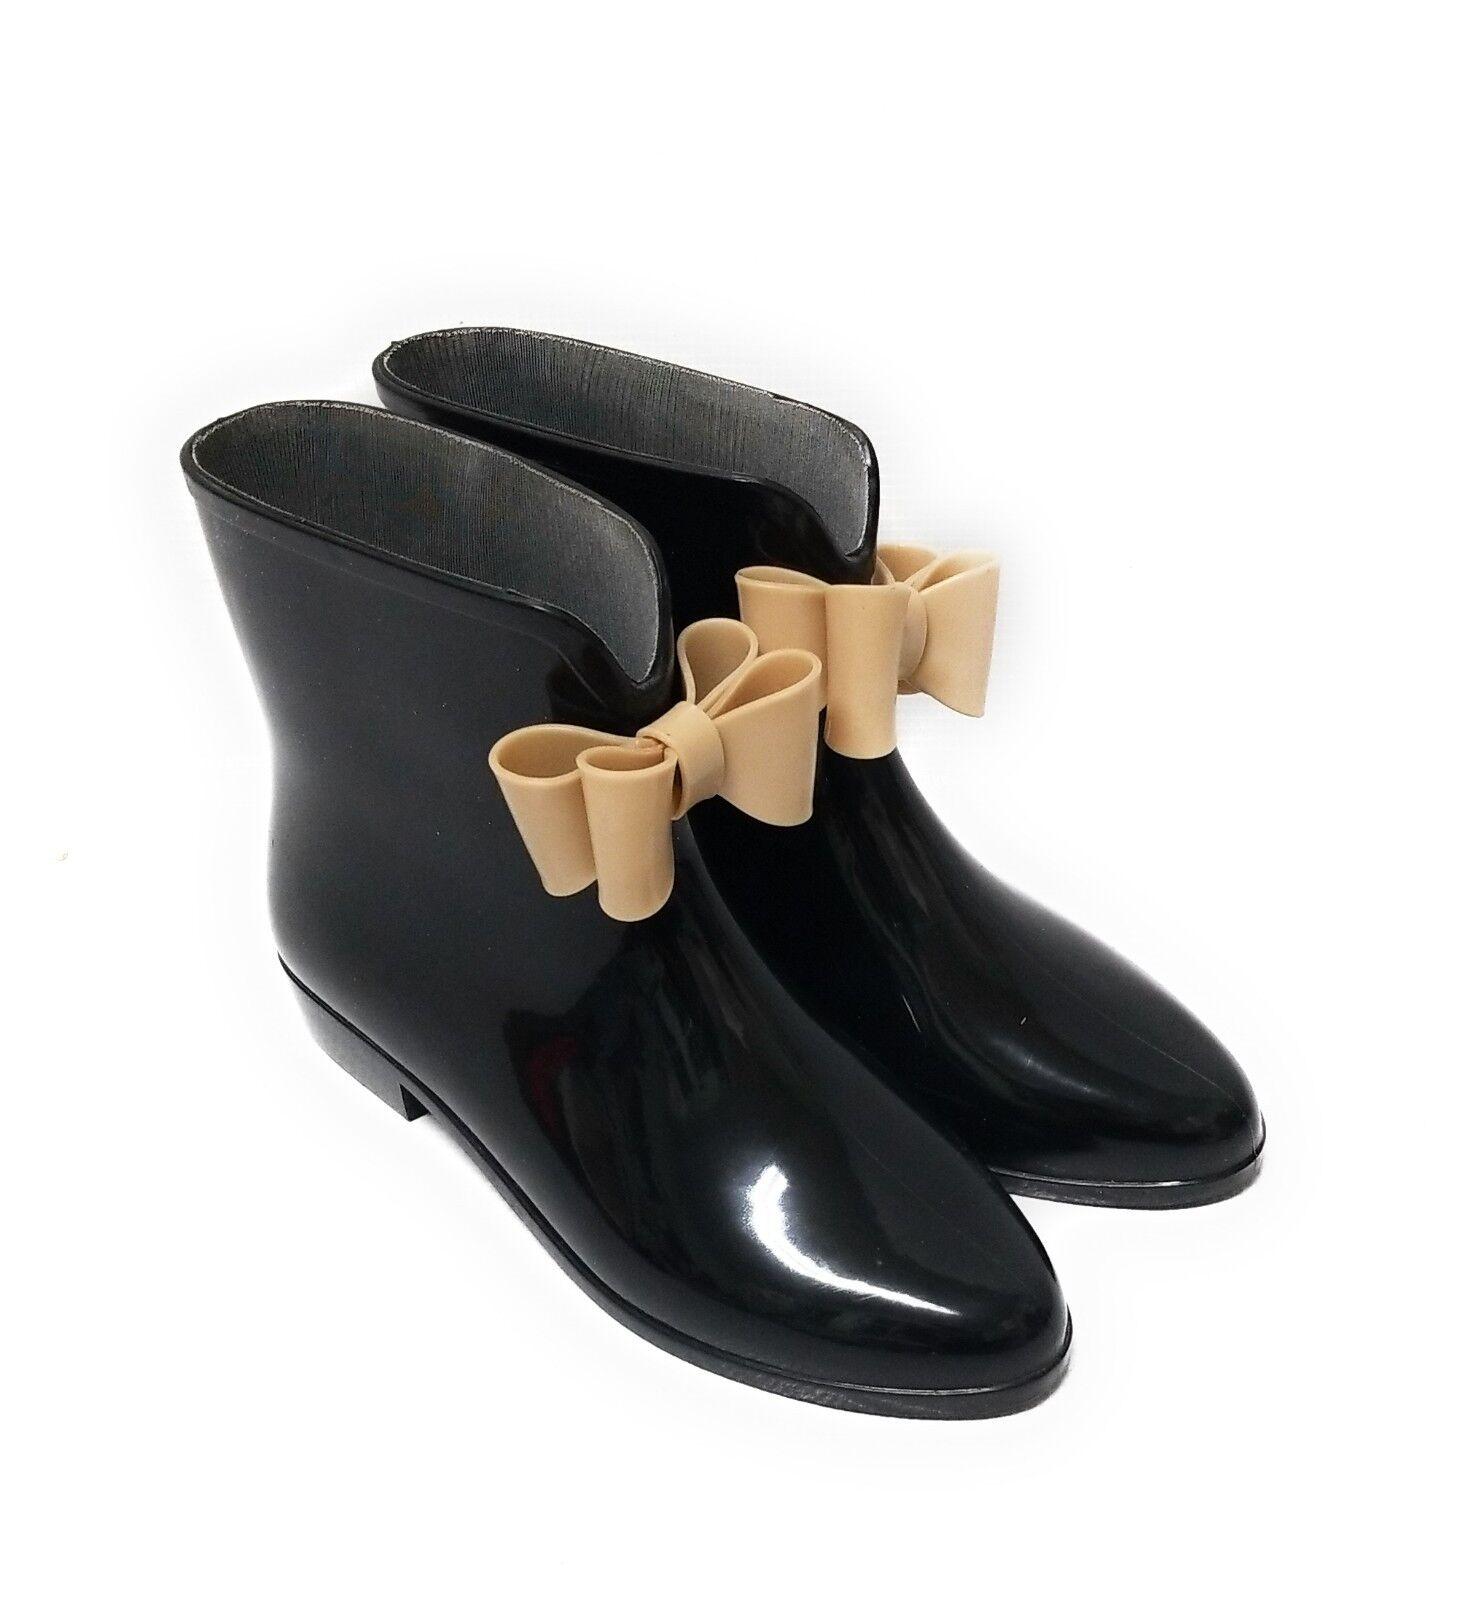 Dizzy para mujeres botas De Lluvia De De De Goma Negra con Arcos Talla 7  venta con descuento